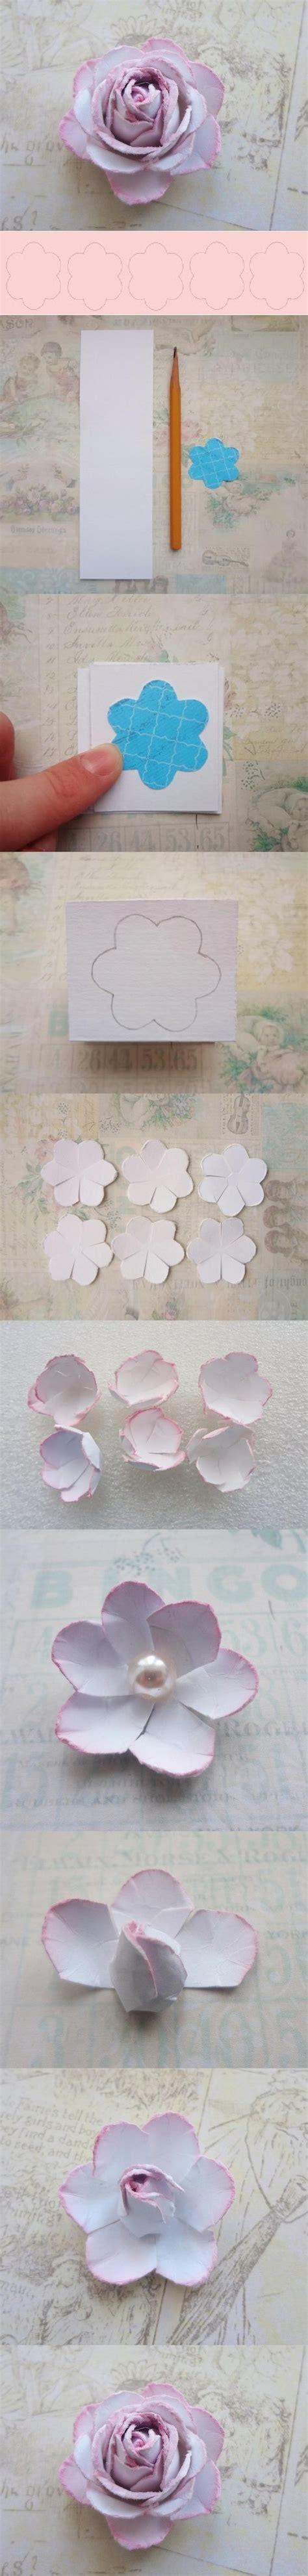 Handmade Rosettes - diy handmade rosettes diy handmade rosettes